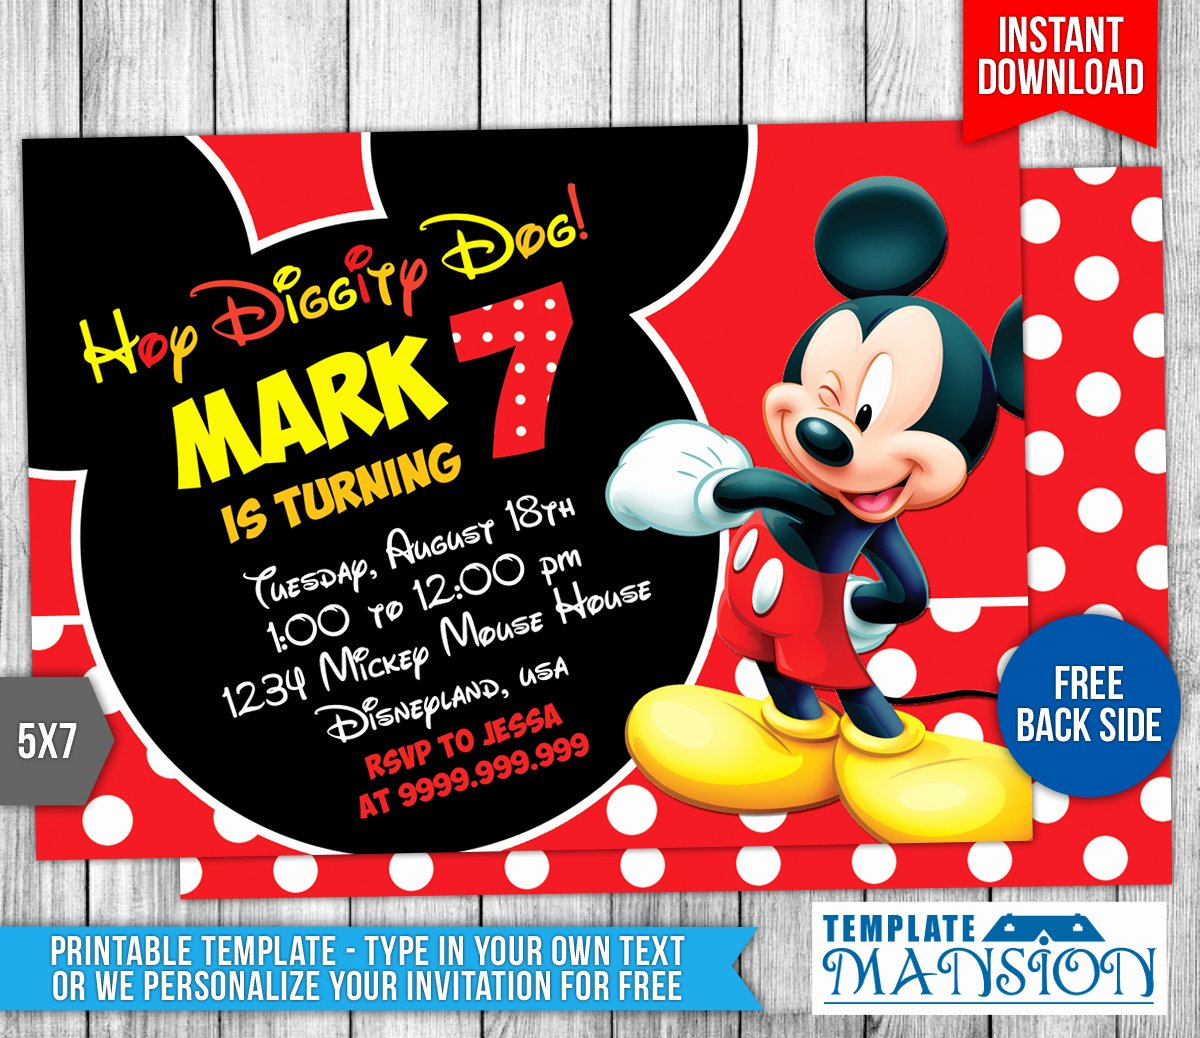 Mickey Mouse Birthday Invitation Template Fresh Mickey Mouse Birthday Invitation 4 by Templatemansion On Deviantart